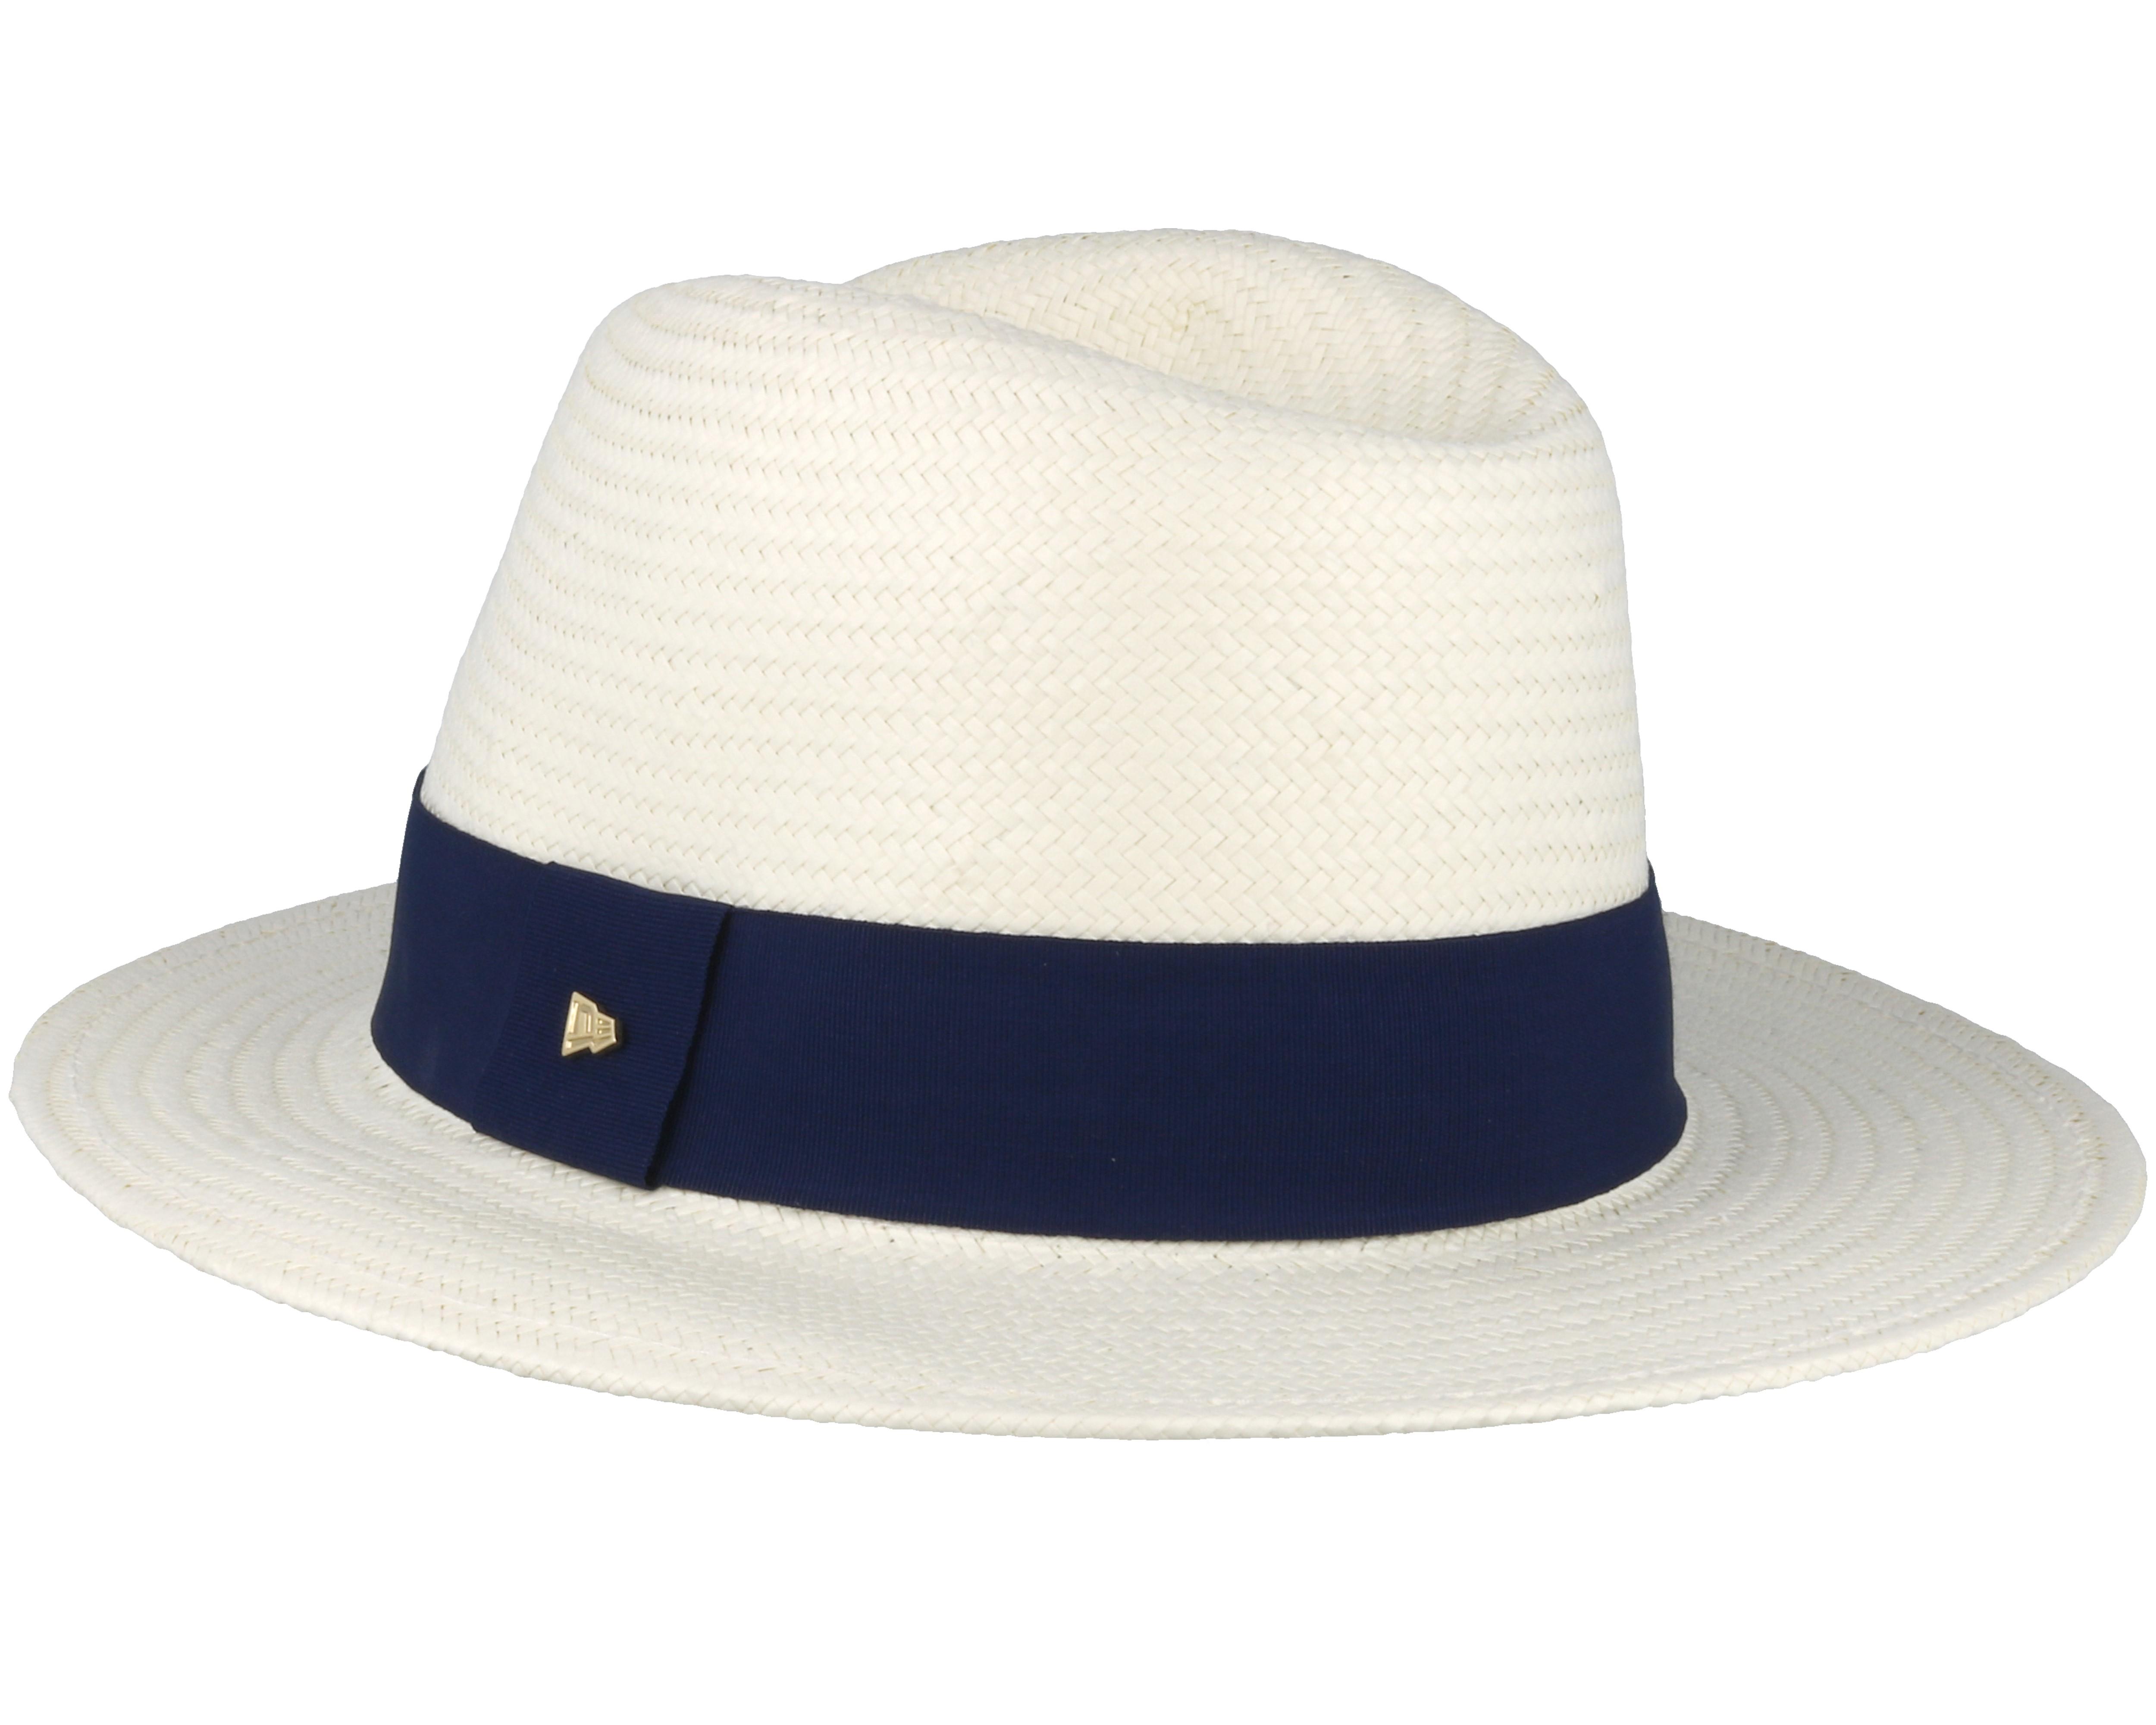 Ryder Cup Panama White Hat - New Era hats | Hatstore.co.uk